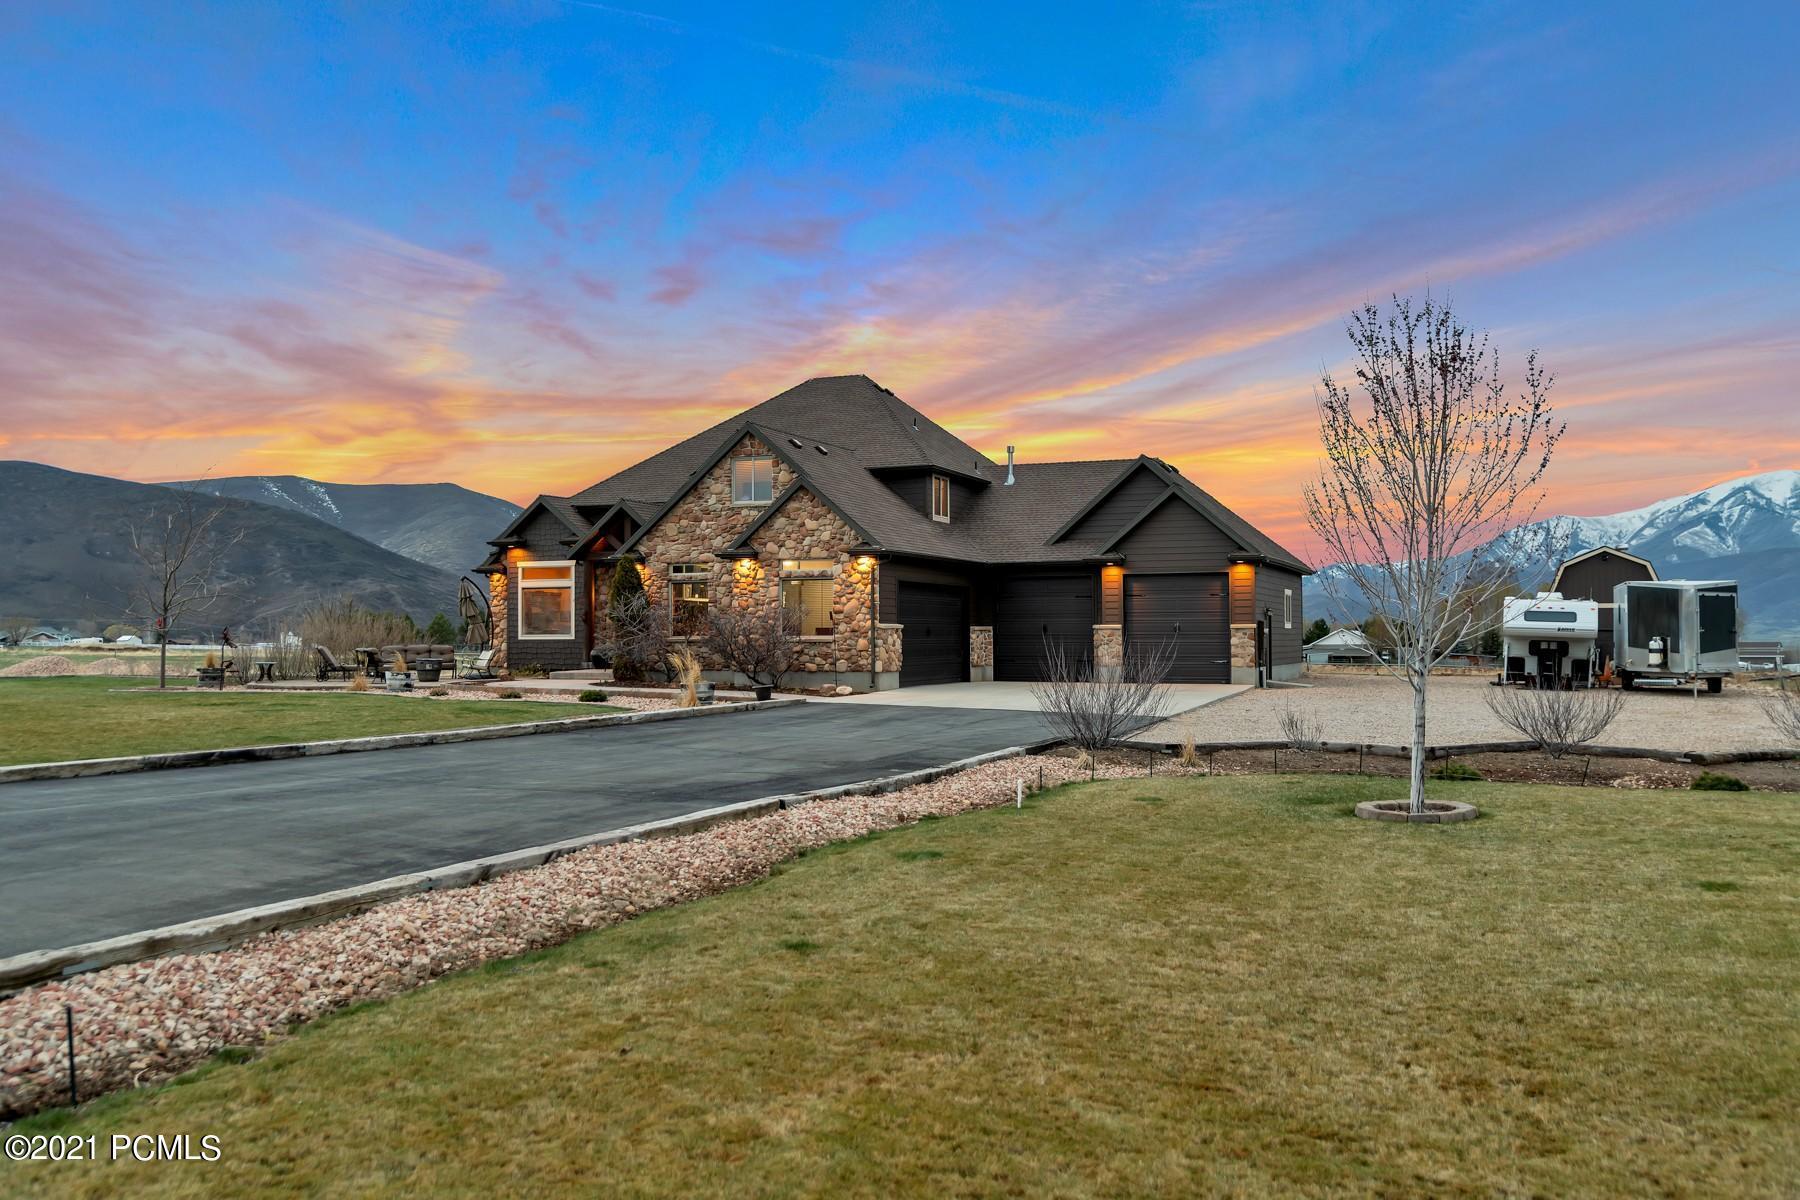 2660 Ranch Drive, Heber City, Utah 84032, 3 Bedrooms Bedrooms, ,3 BathroomsBathrooms,Single Family,For Sale,Ranch,12101485